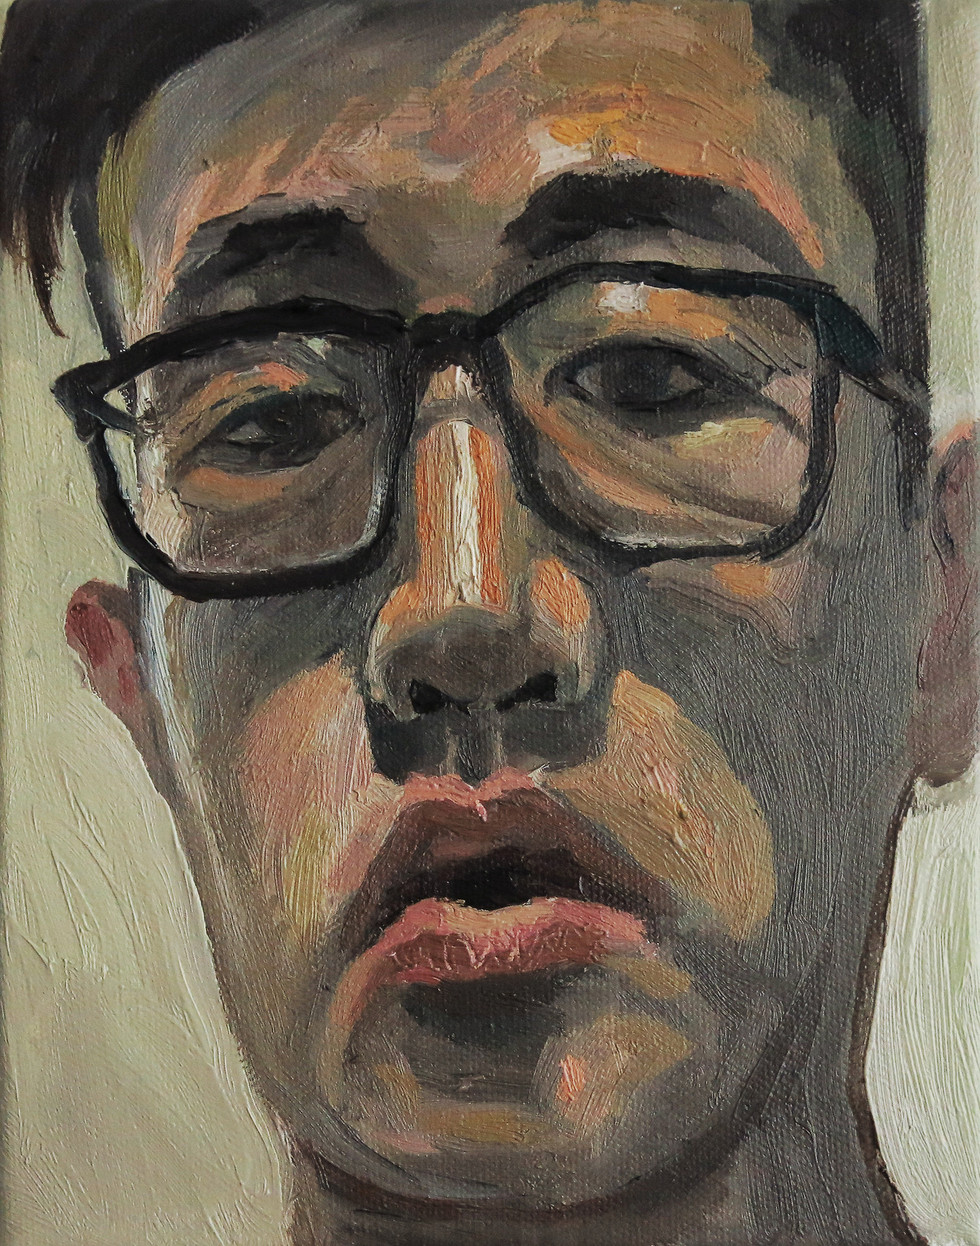 Self Portrait, 2017, Oil on canvas, 15 x 20cm  Private Collection, Singapore